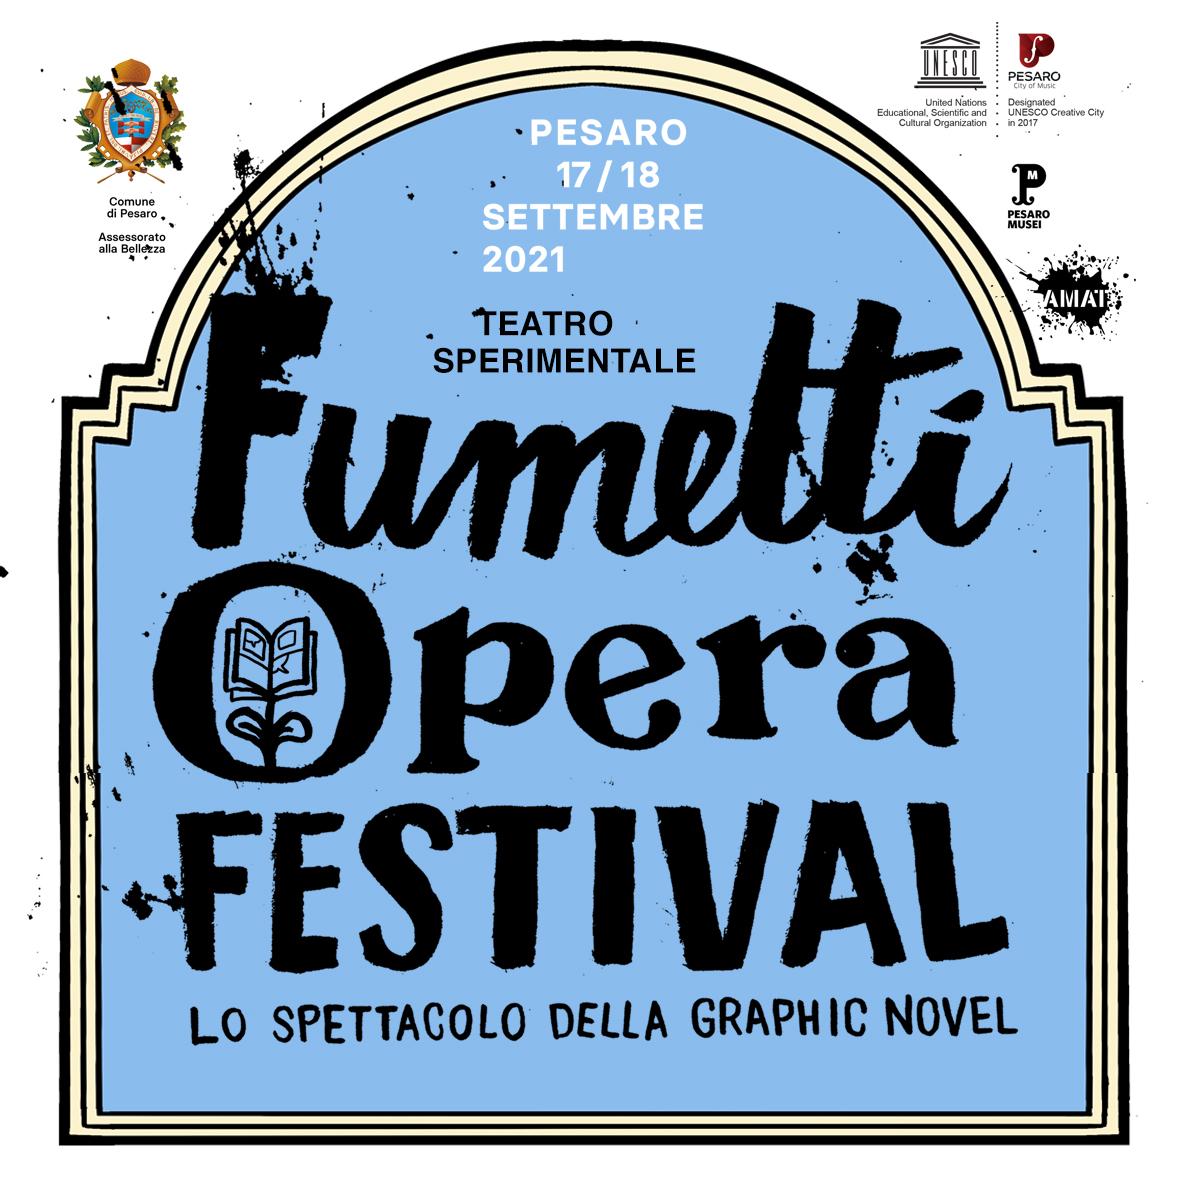 Pesaro Fumetti Opera Festival